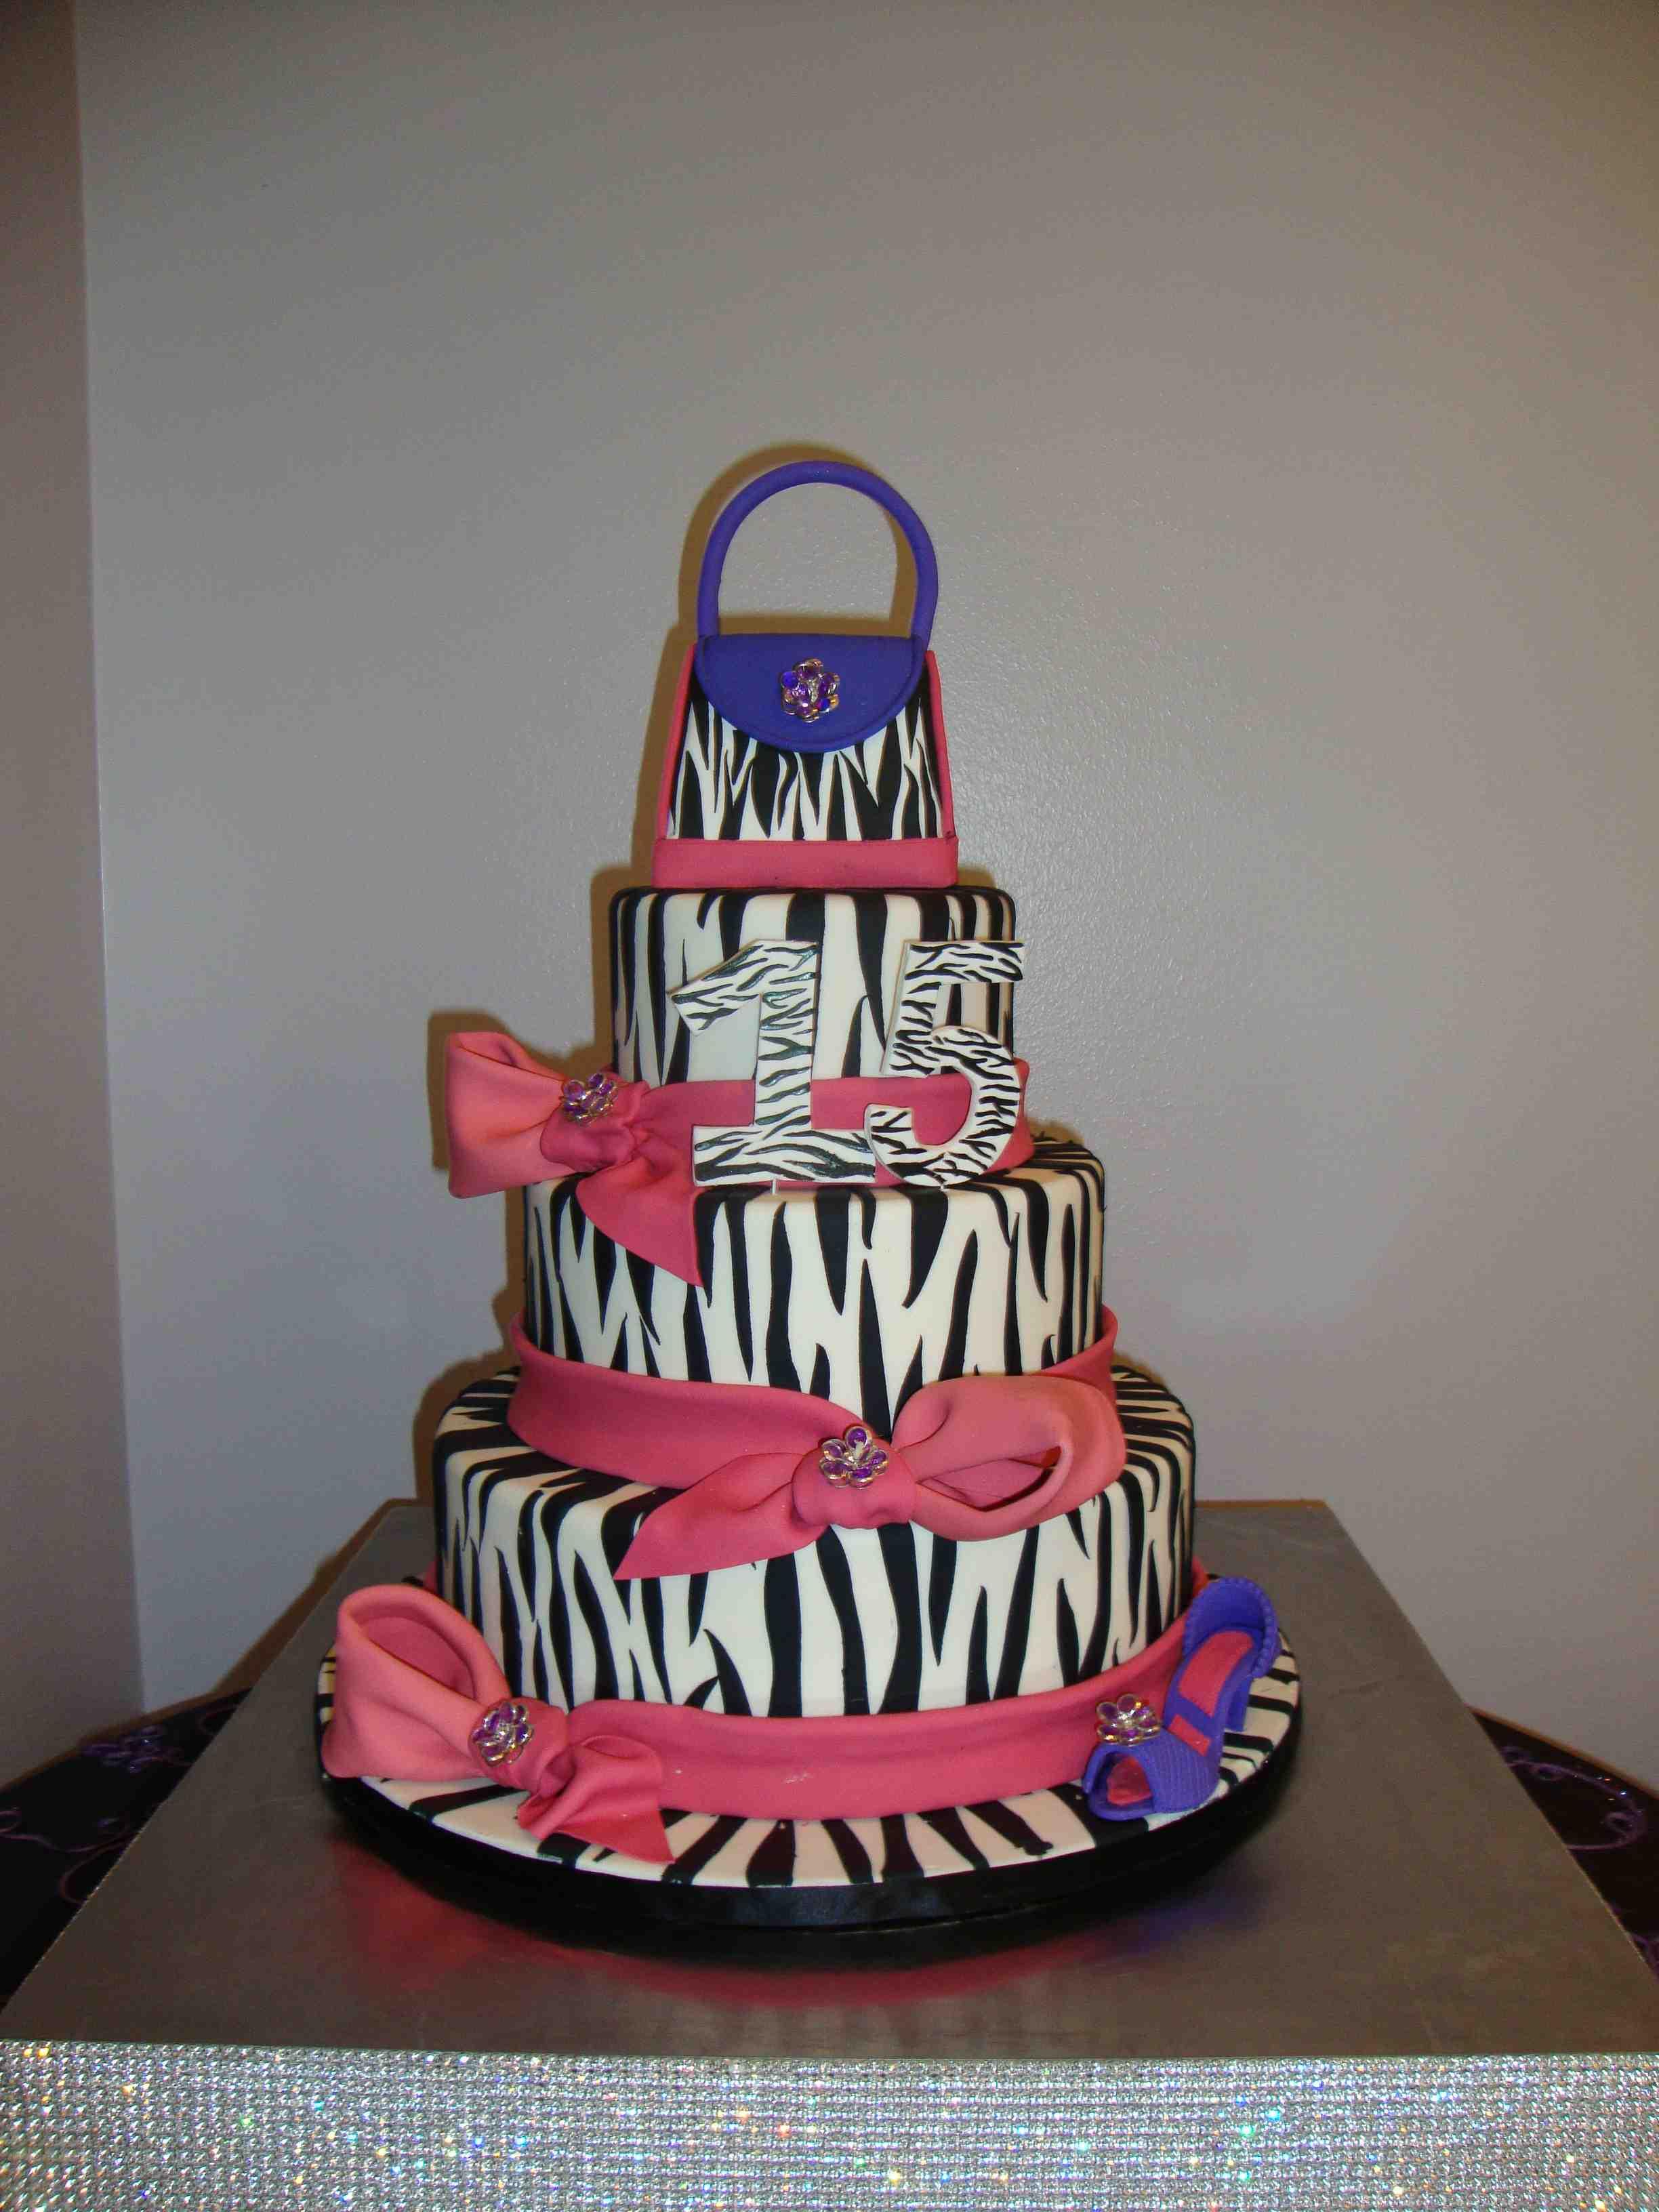 Cakes Delivery In Houston Tx Driveeapusedmotorhomefo